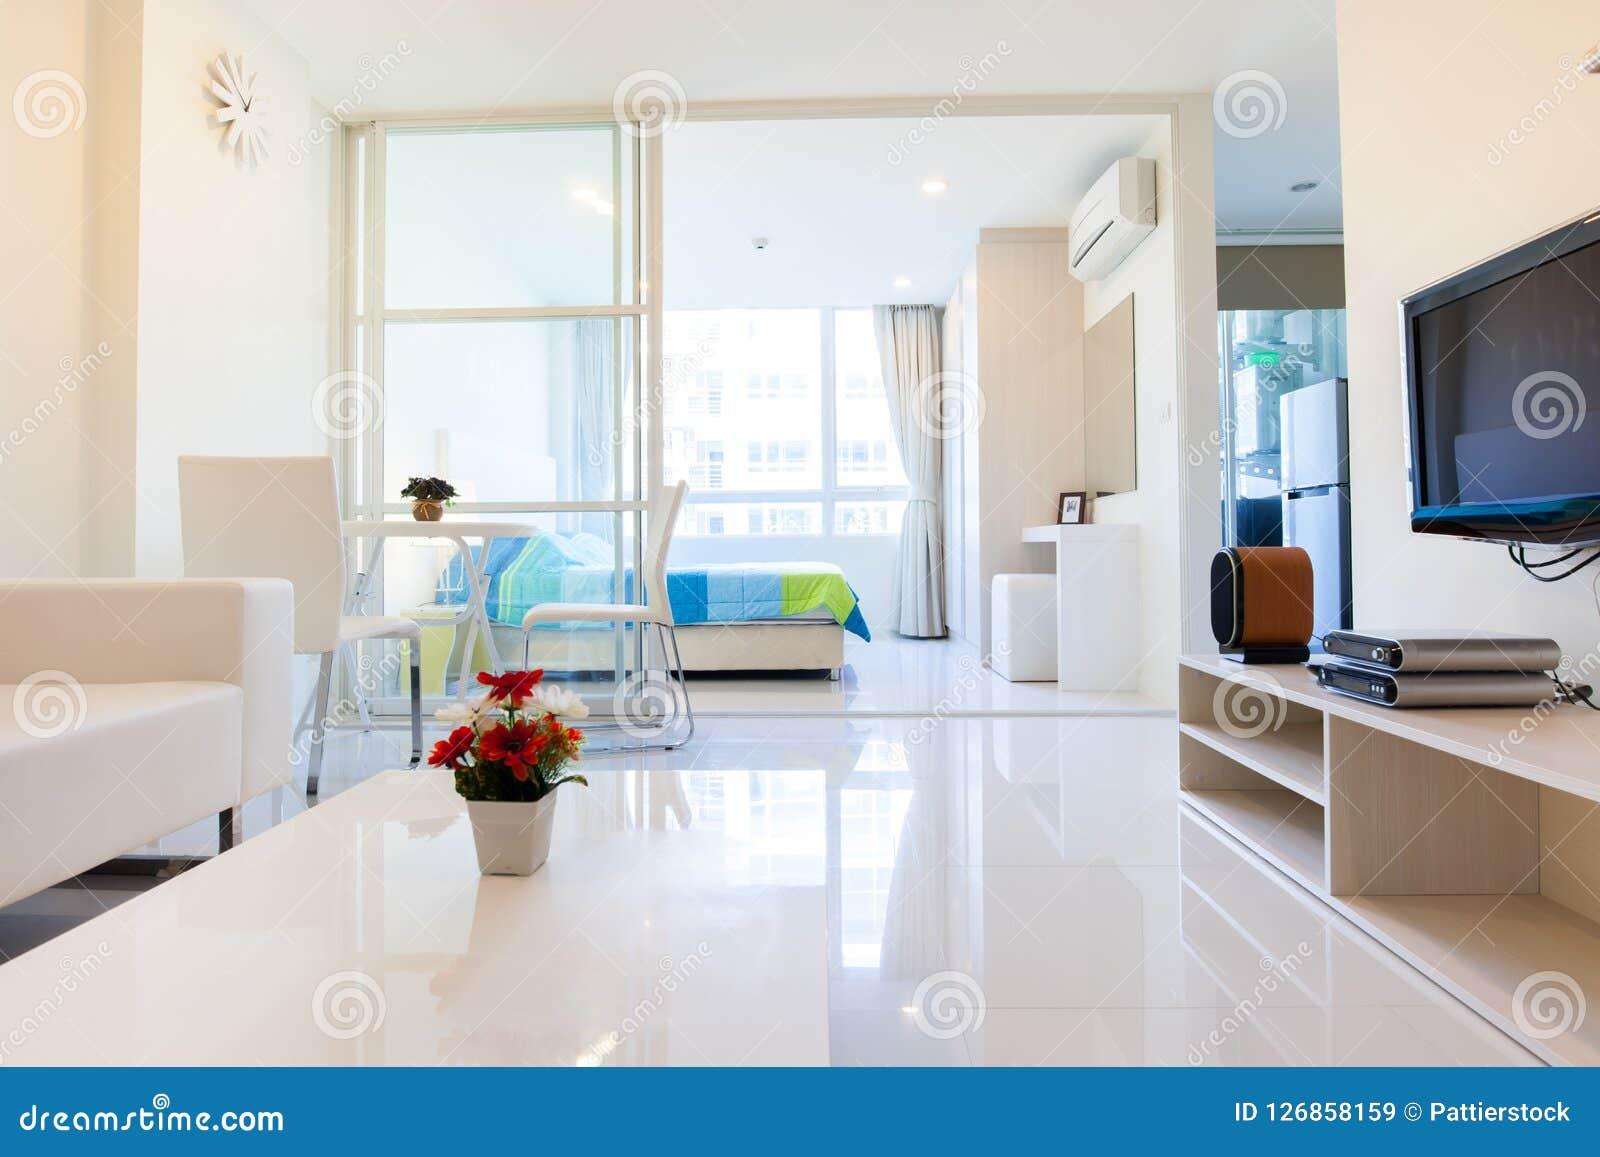 Sala de visitas e quarto modernos do condomínio